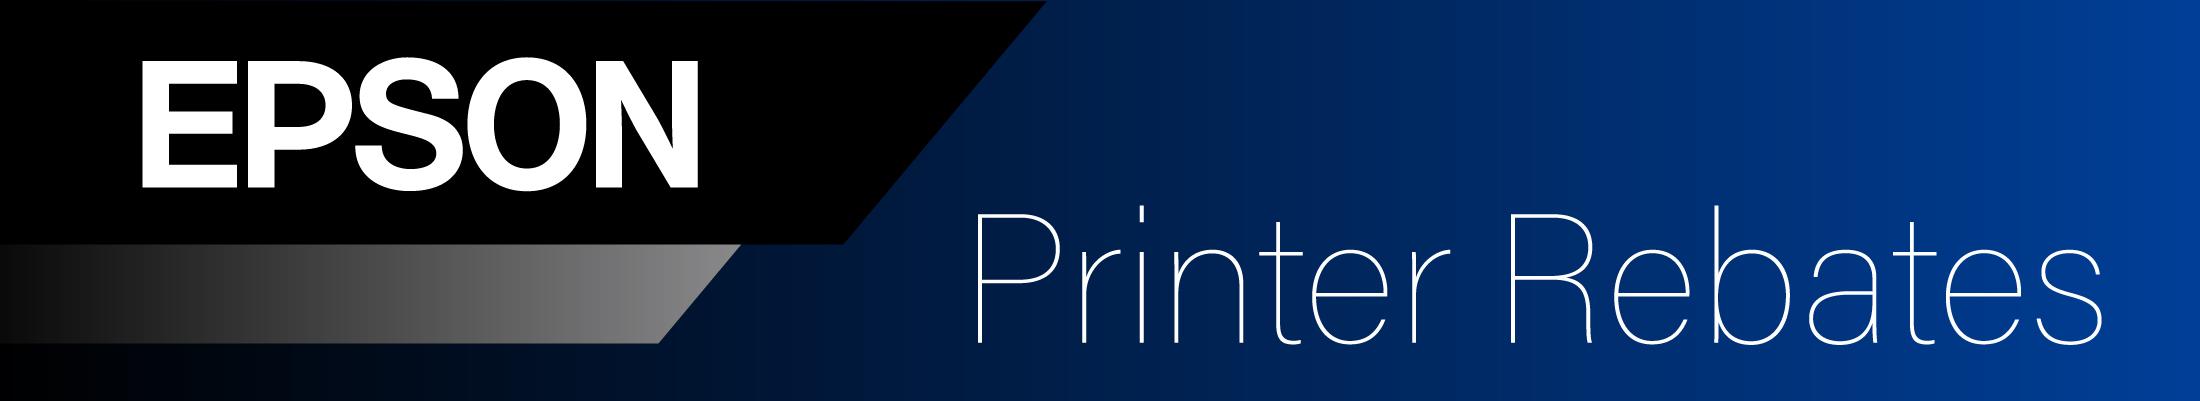 Printer_Rebates 04-07-21_01_Epson_LandingPage_2200x400px